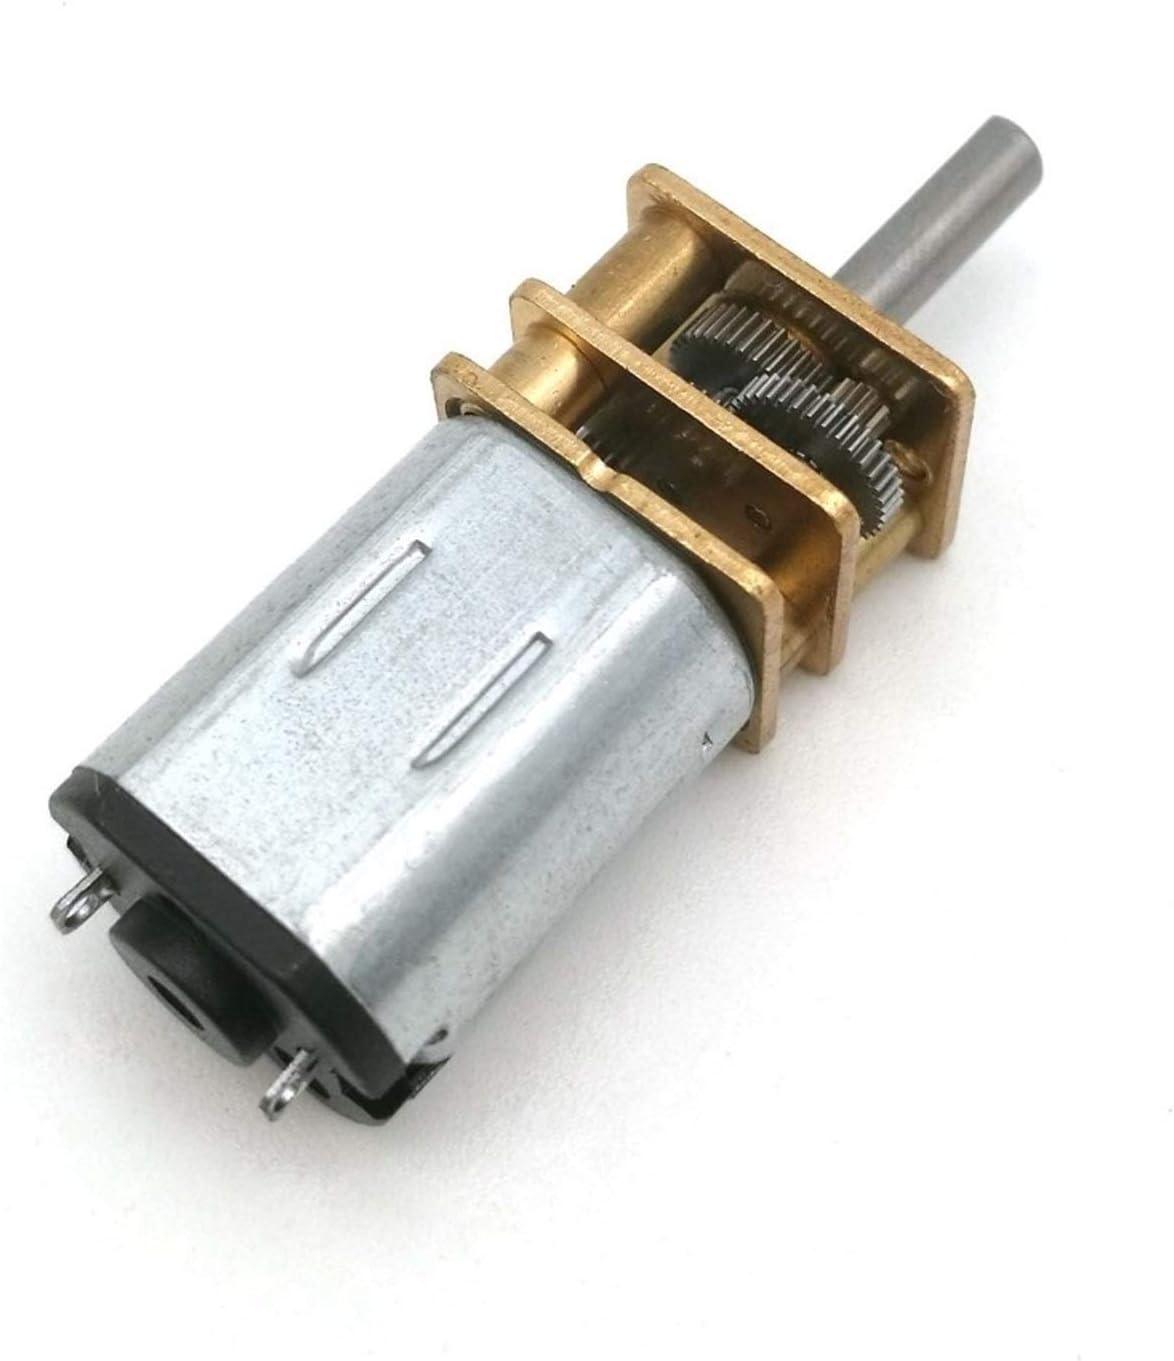 Voltage Speed V WSCHENG 1Pc Electric N20 Micro Speed Gear Motor DC 3V 6V 12V Reduction Gear Motor Gear Reducer Motor For Car Robot Model : 3V : 15RPM RPM